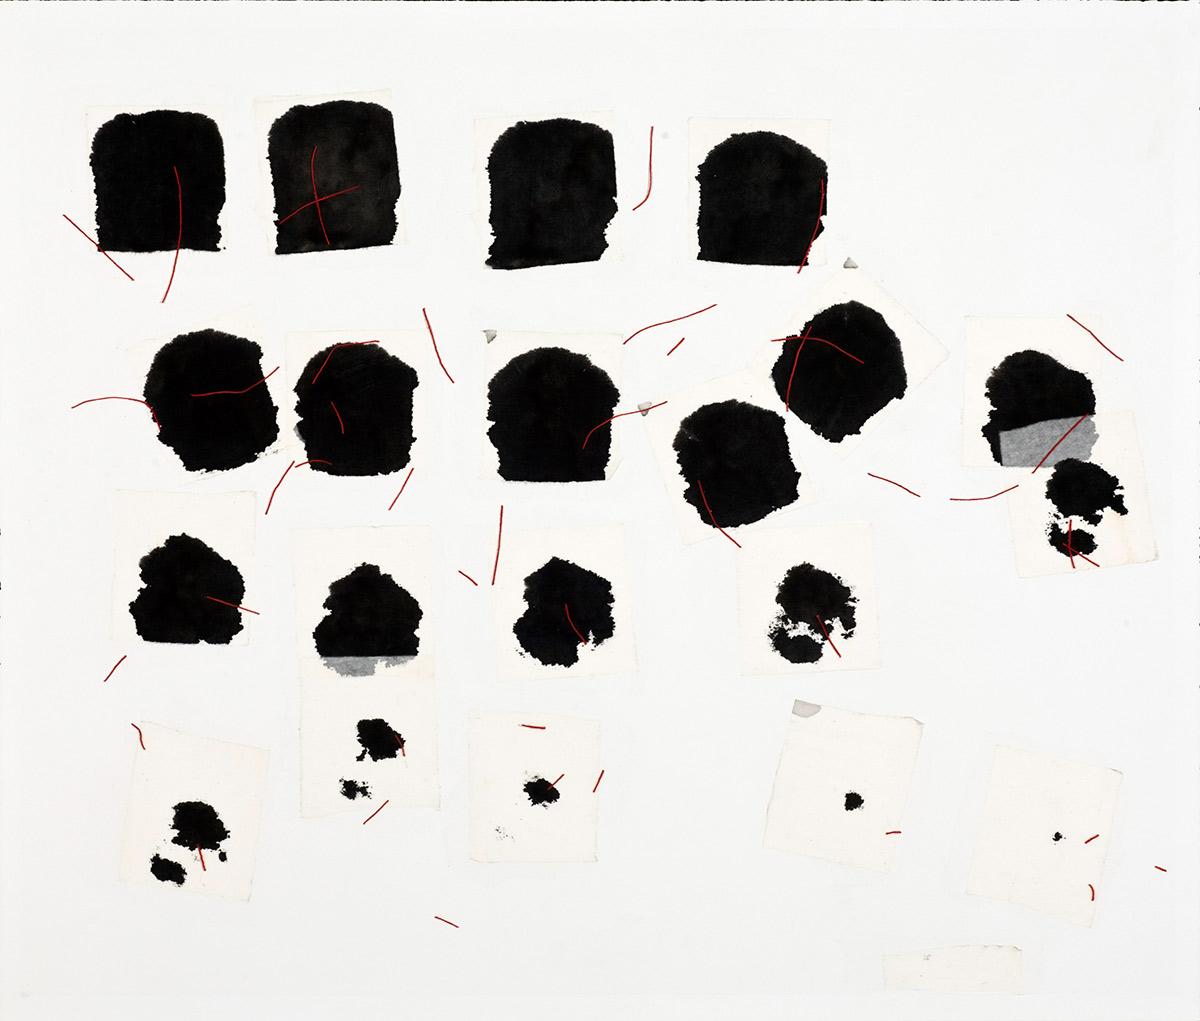 Mixed Media Painting by Glenn Carter